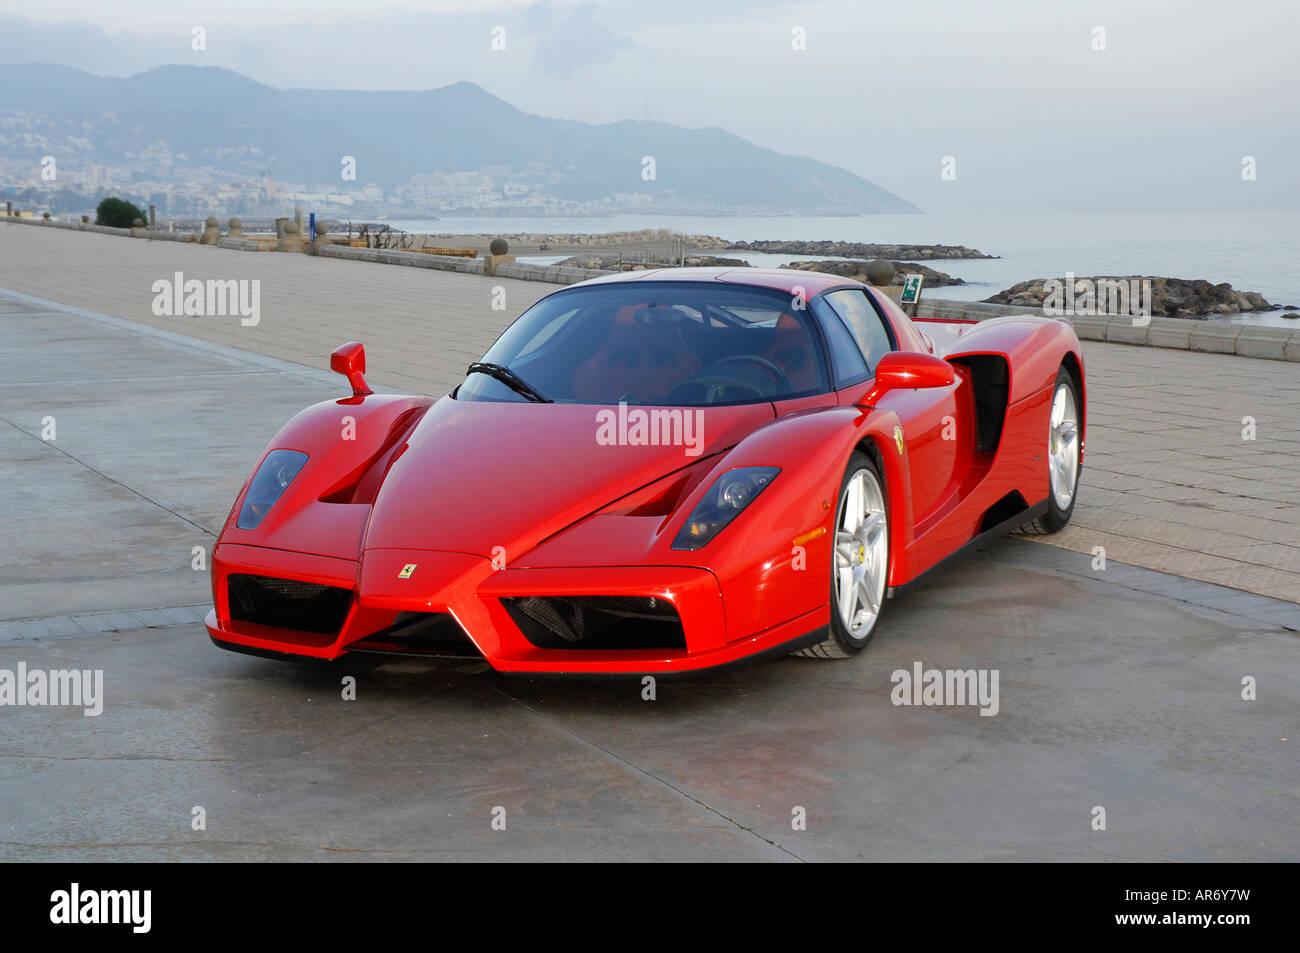 2003 Ferrari Enzo - Stock Image